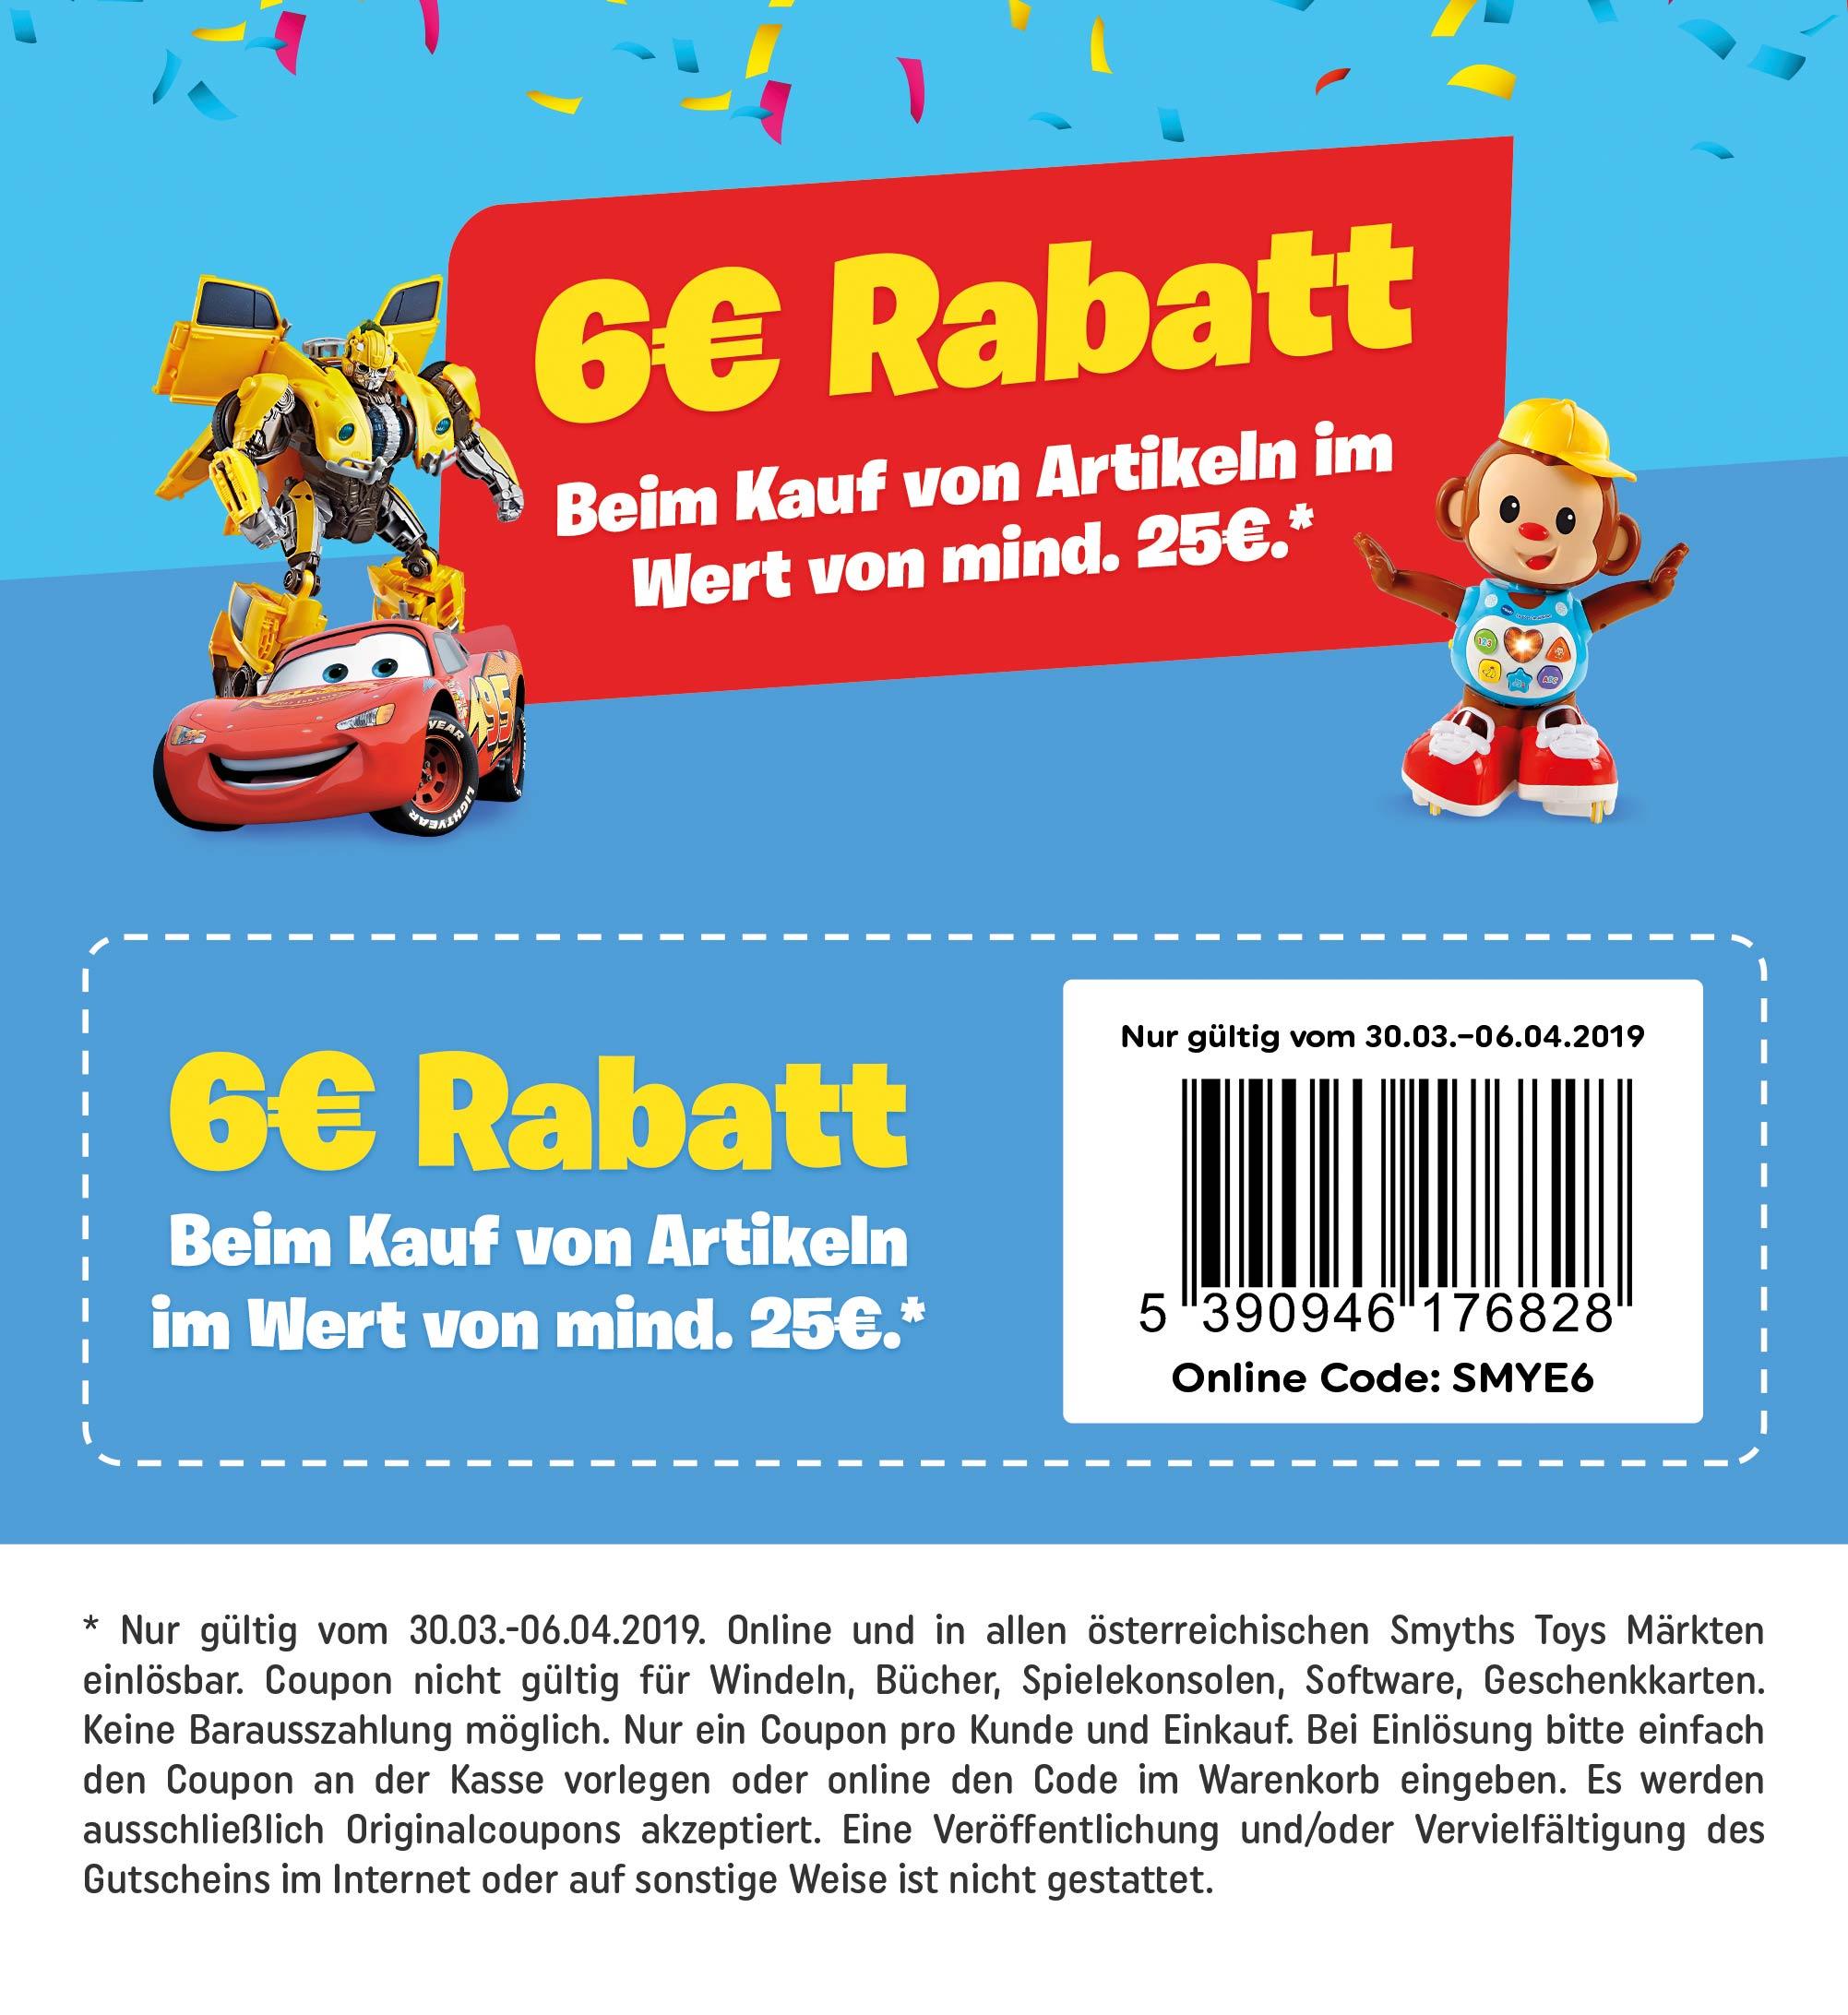 Smyths Toys: 6€ Rabatt ab 25€ - Online und in allen Märkten